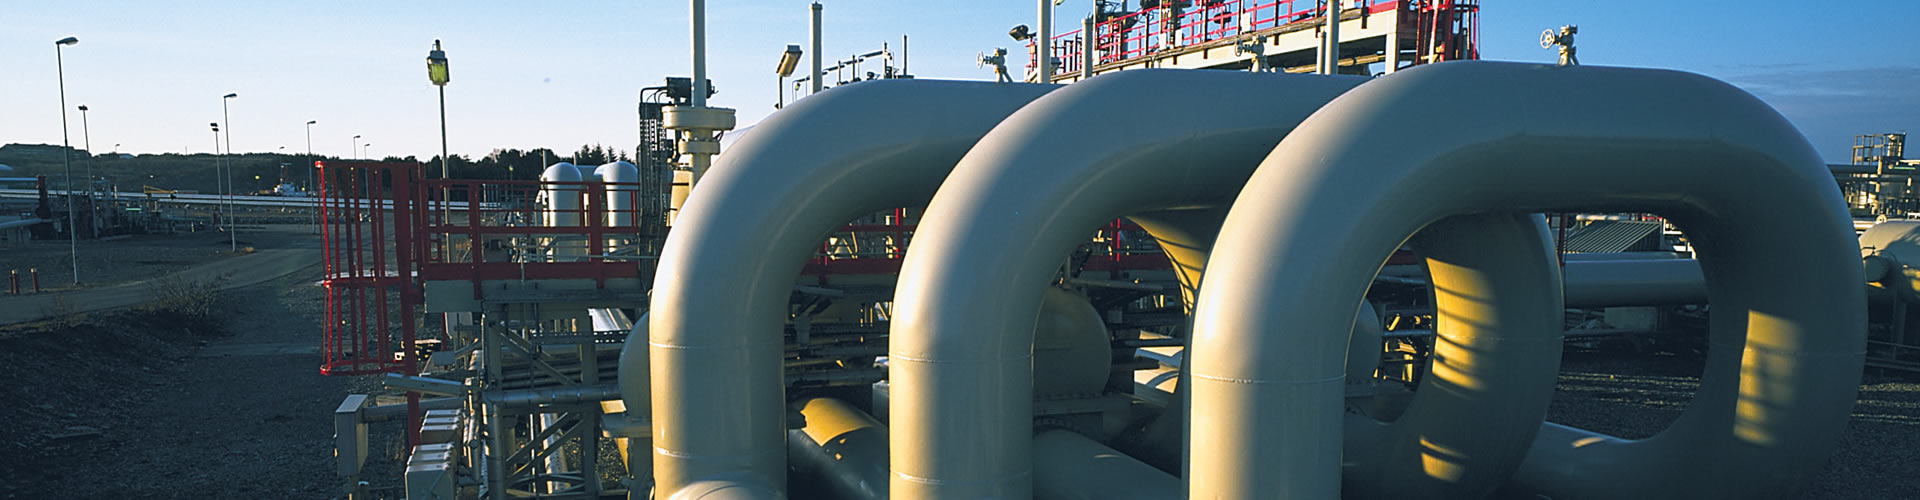 Gulf Farabi Petrochemical Company Careers Naukrigulfcom - mandegar info